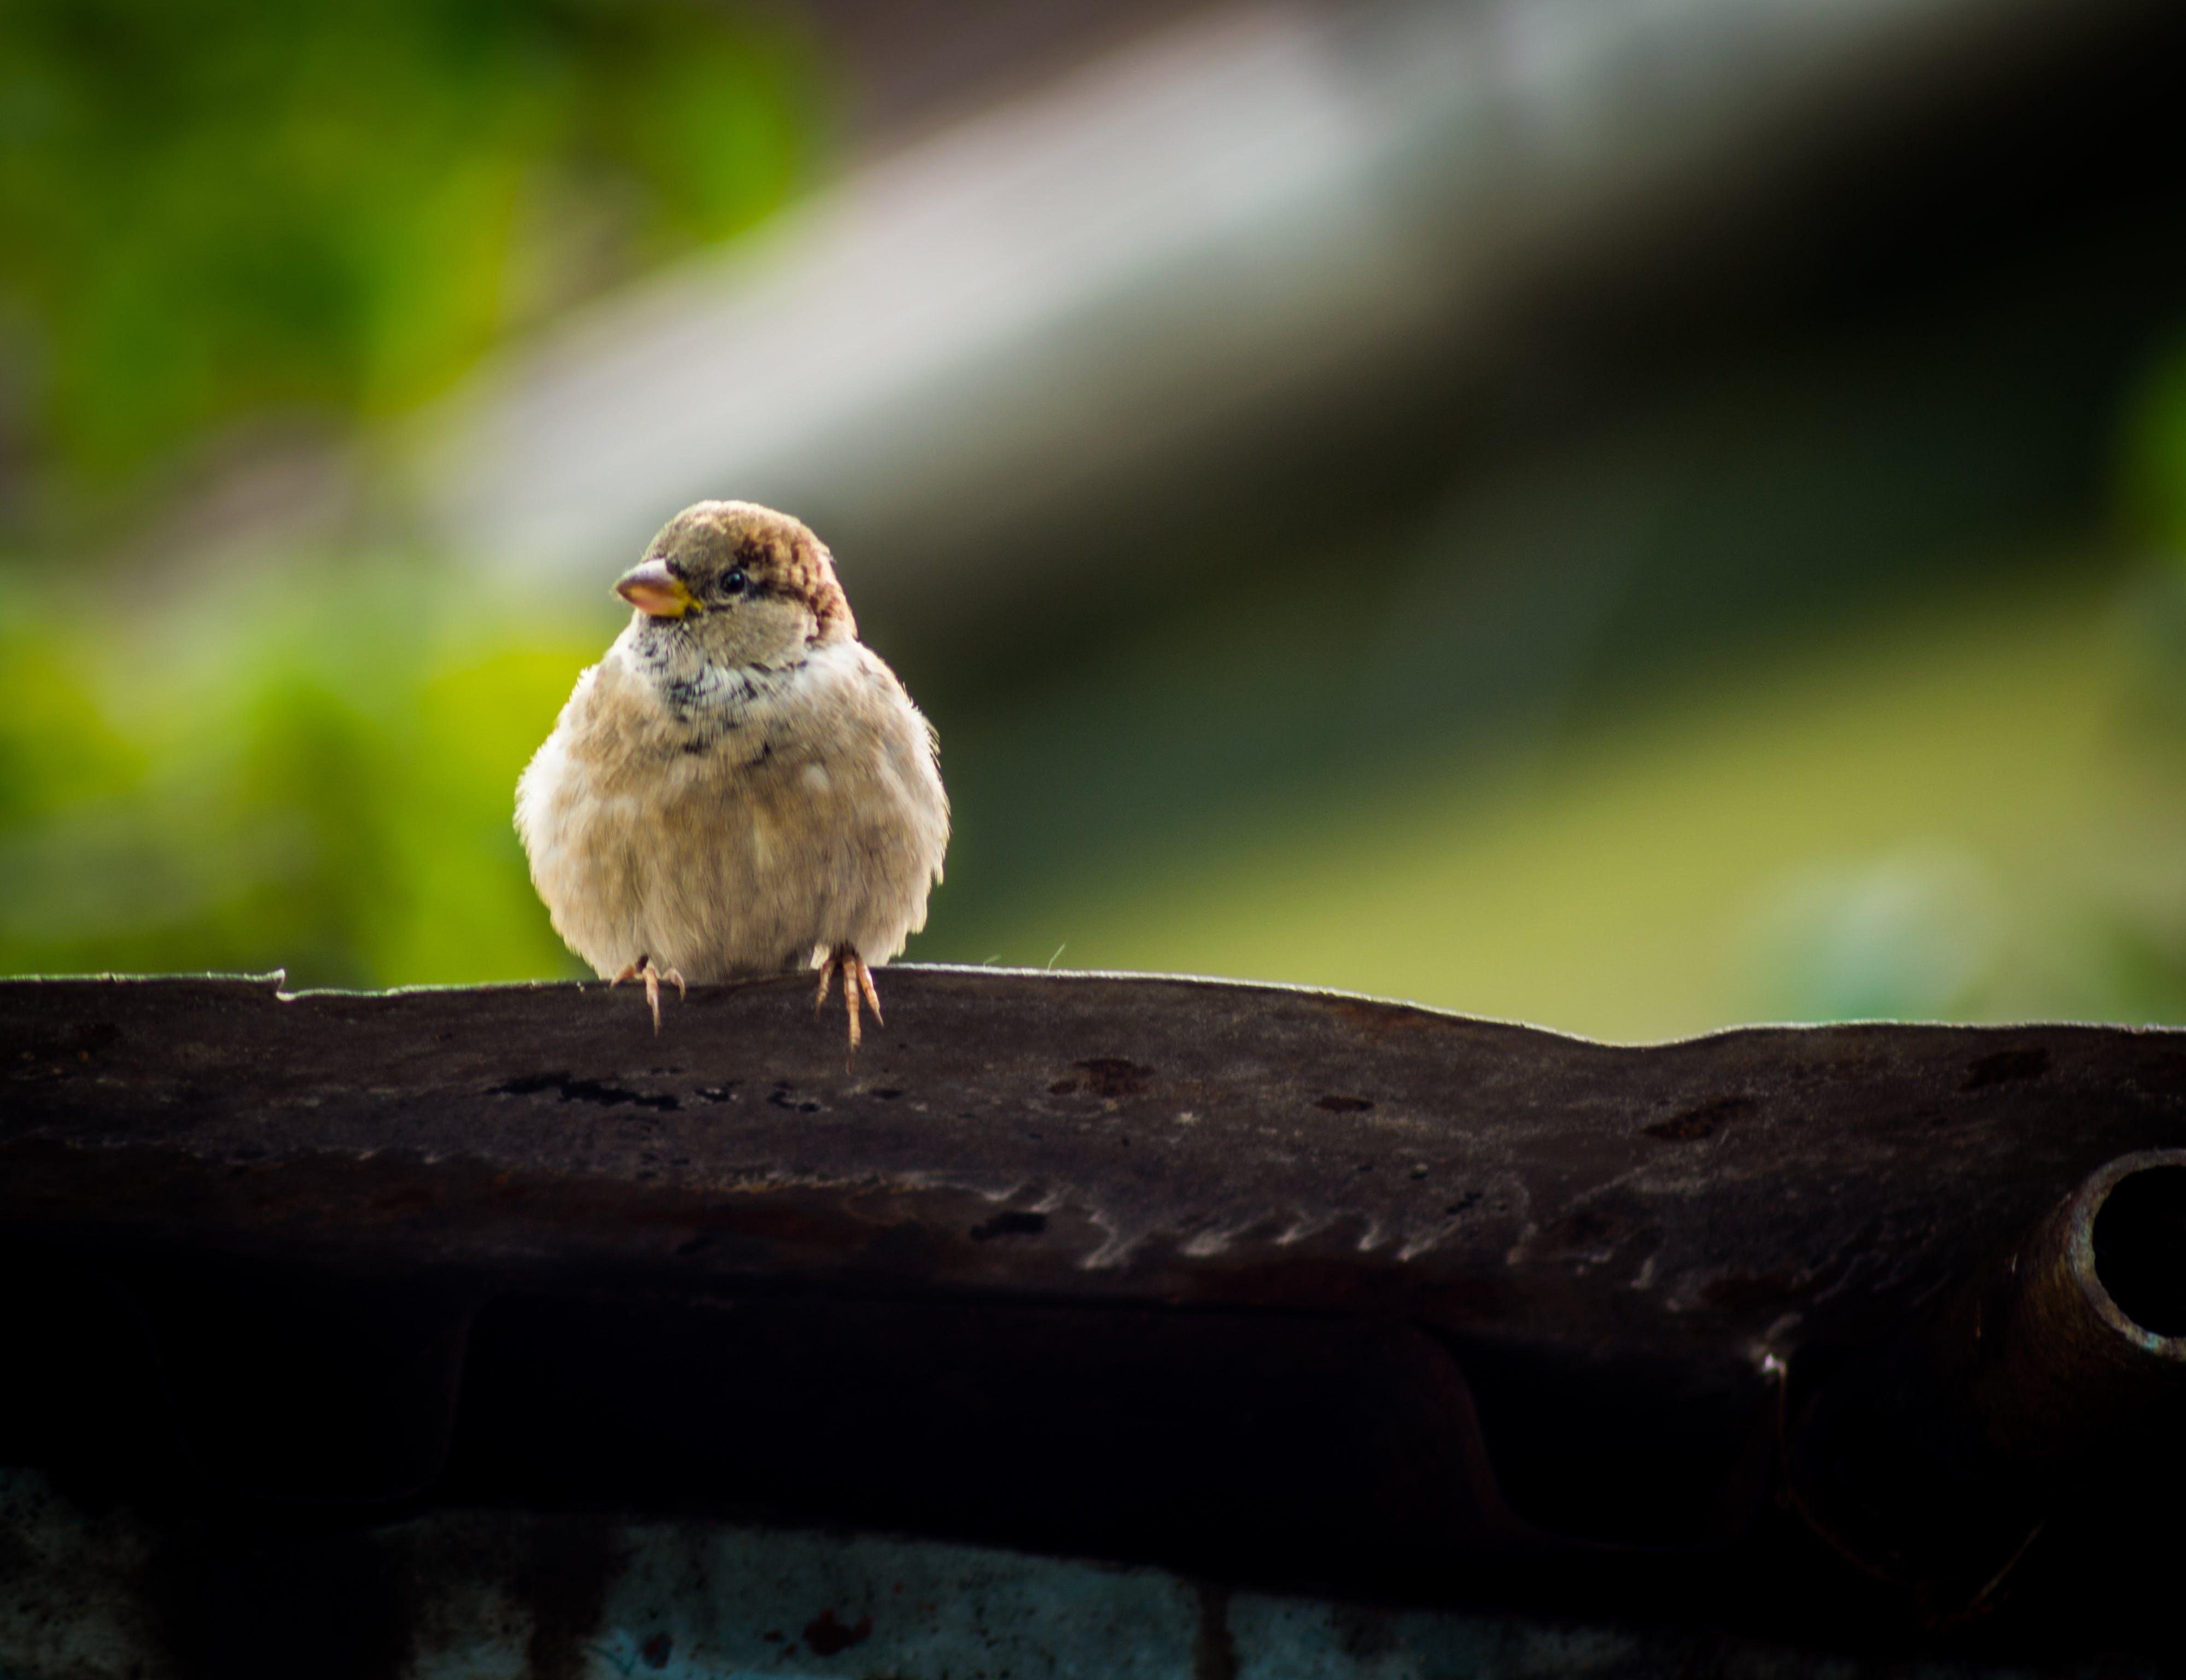 Free stock photo of birds, close up, macro, nature